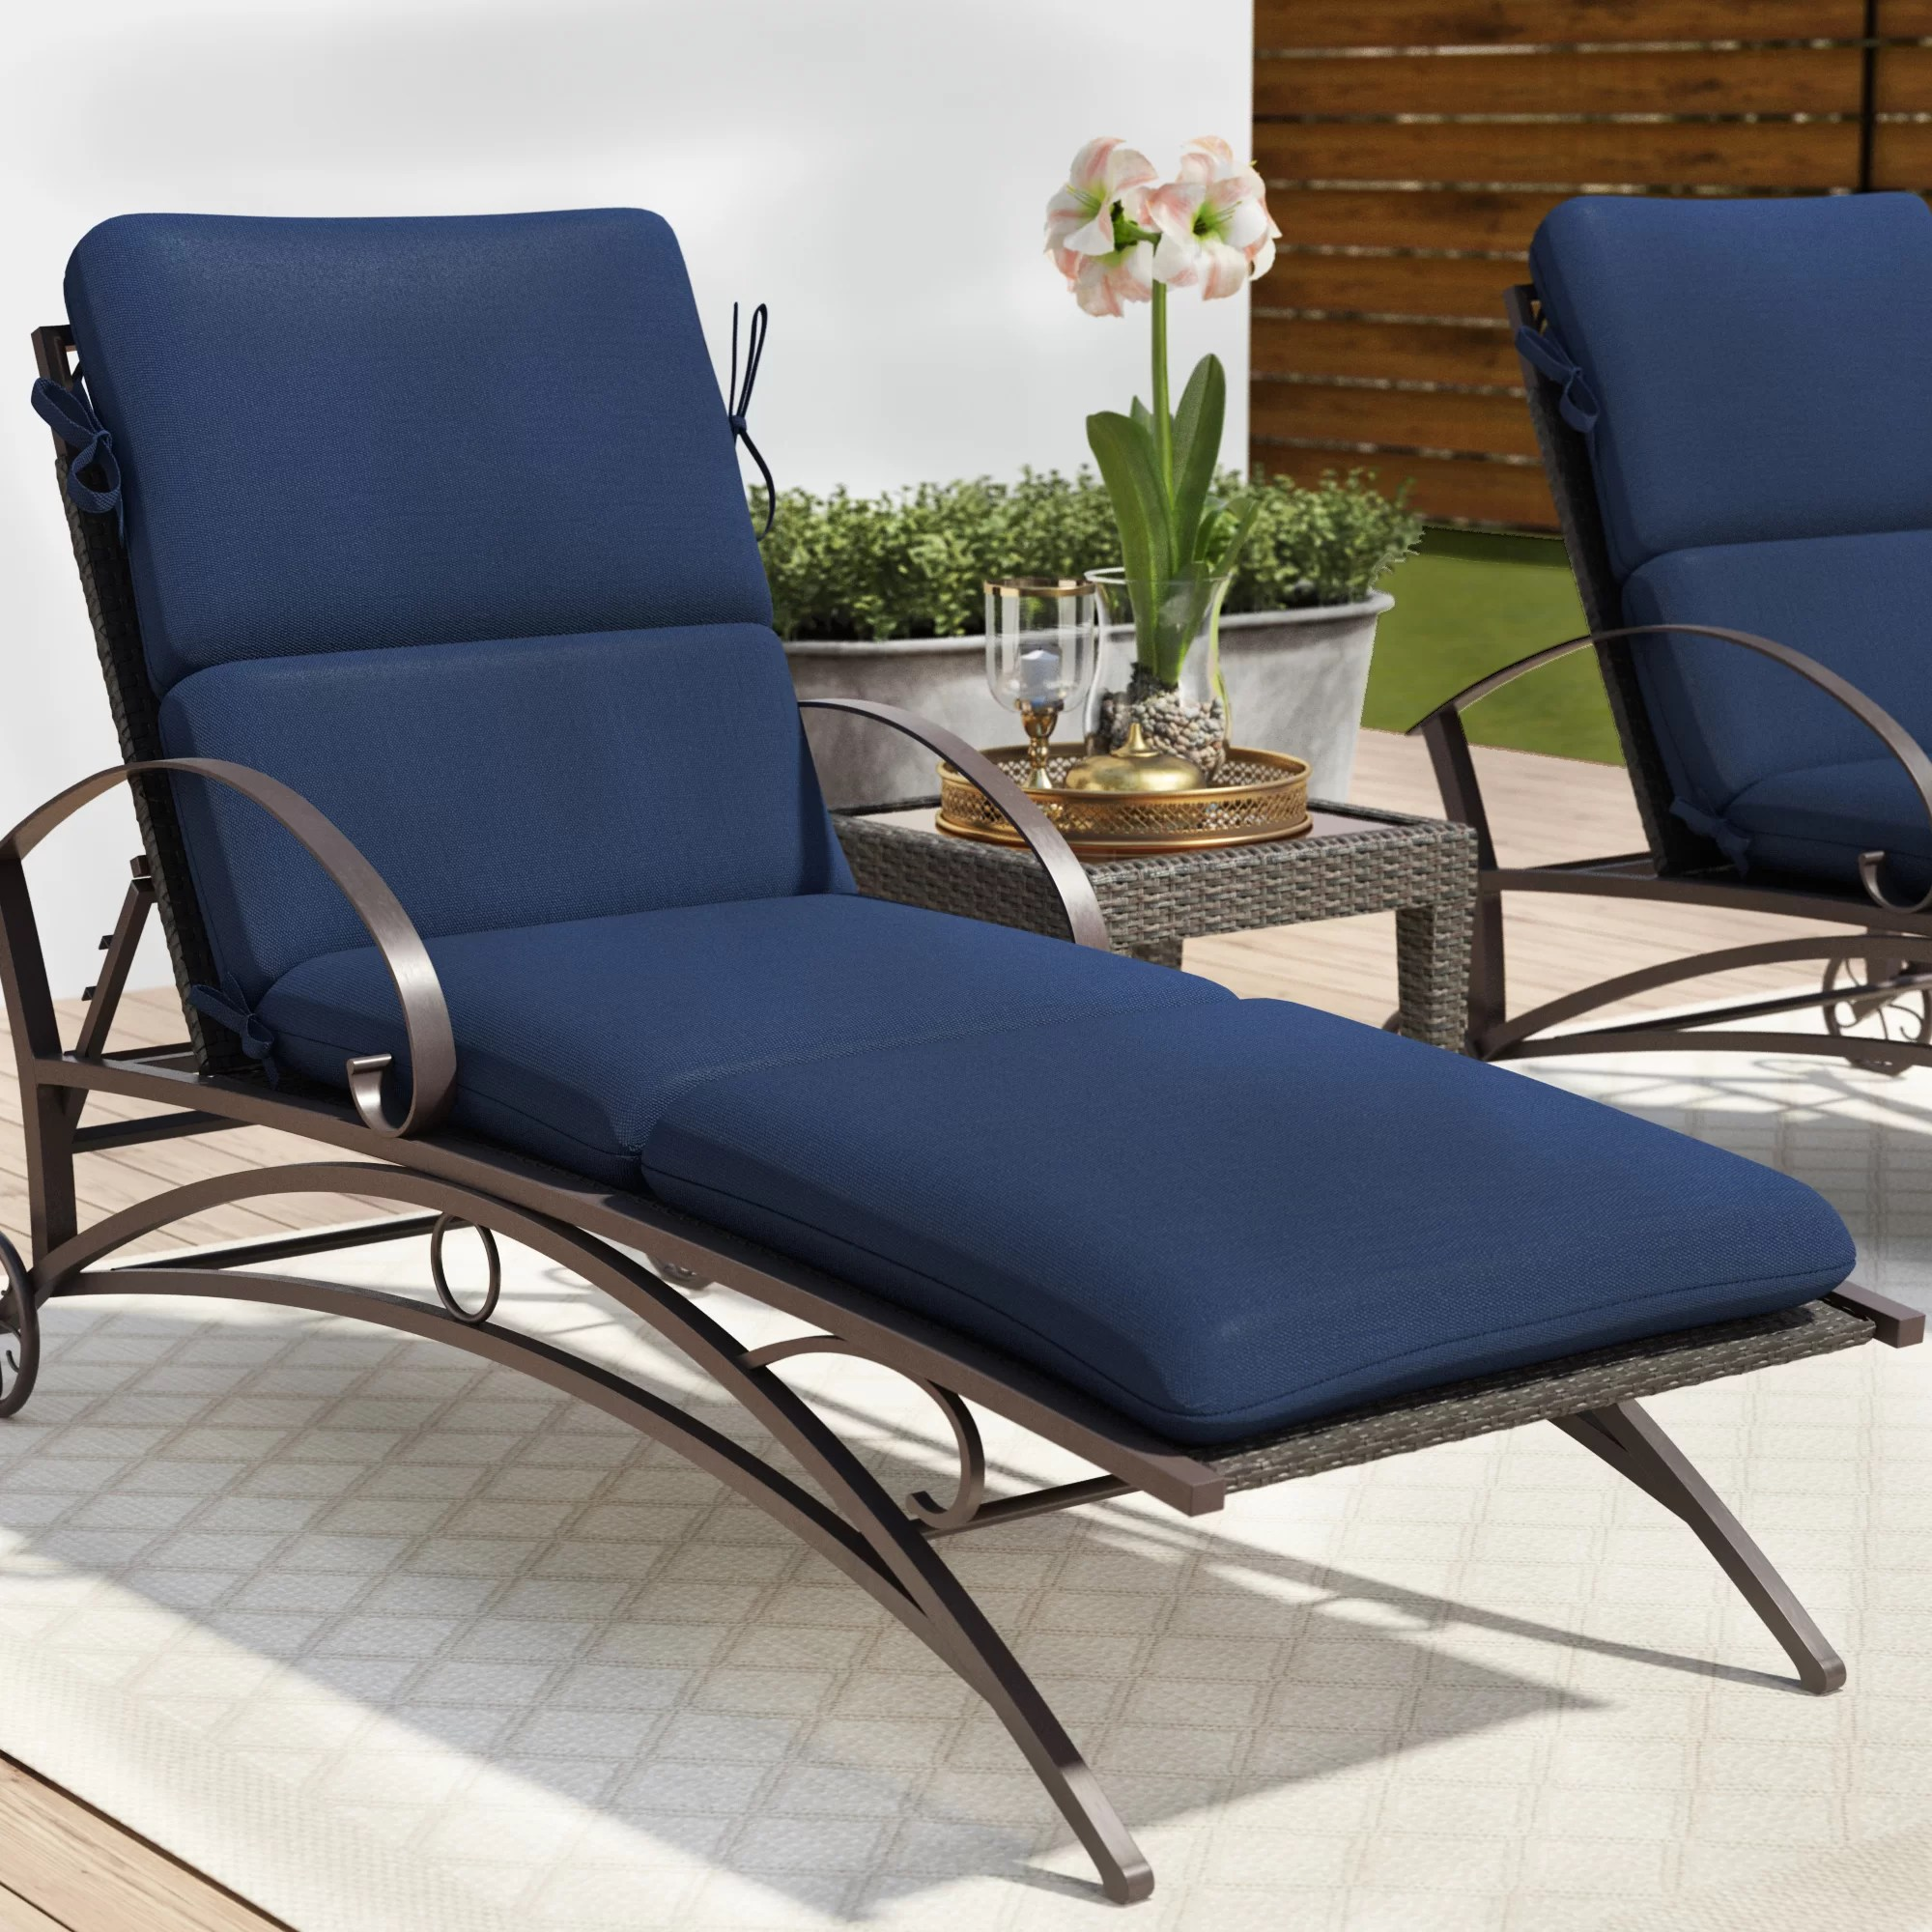 Winston Porter Outdoor Sunbrella Seat Back Cushion Reviews Wayfair